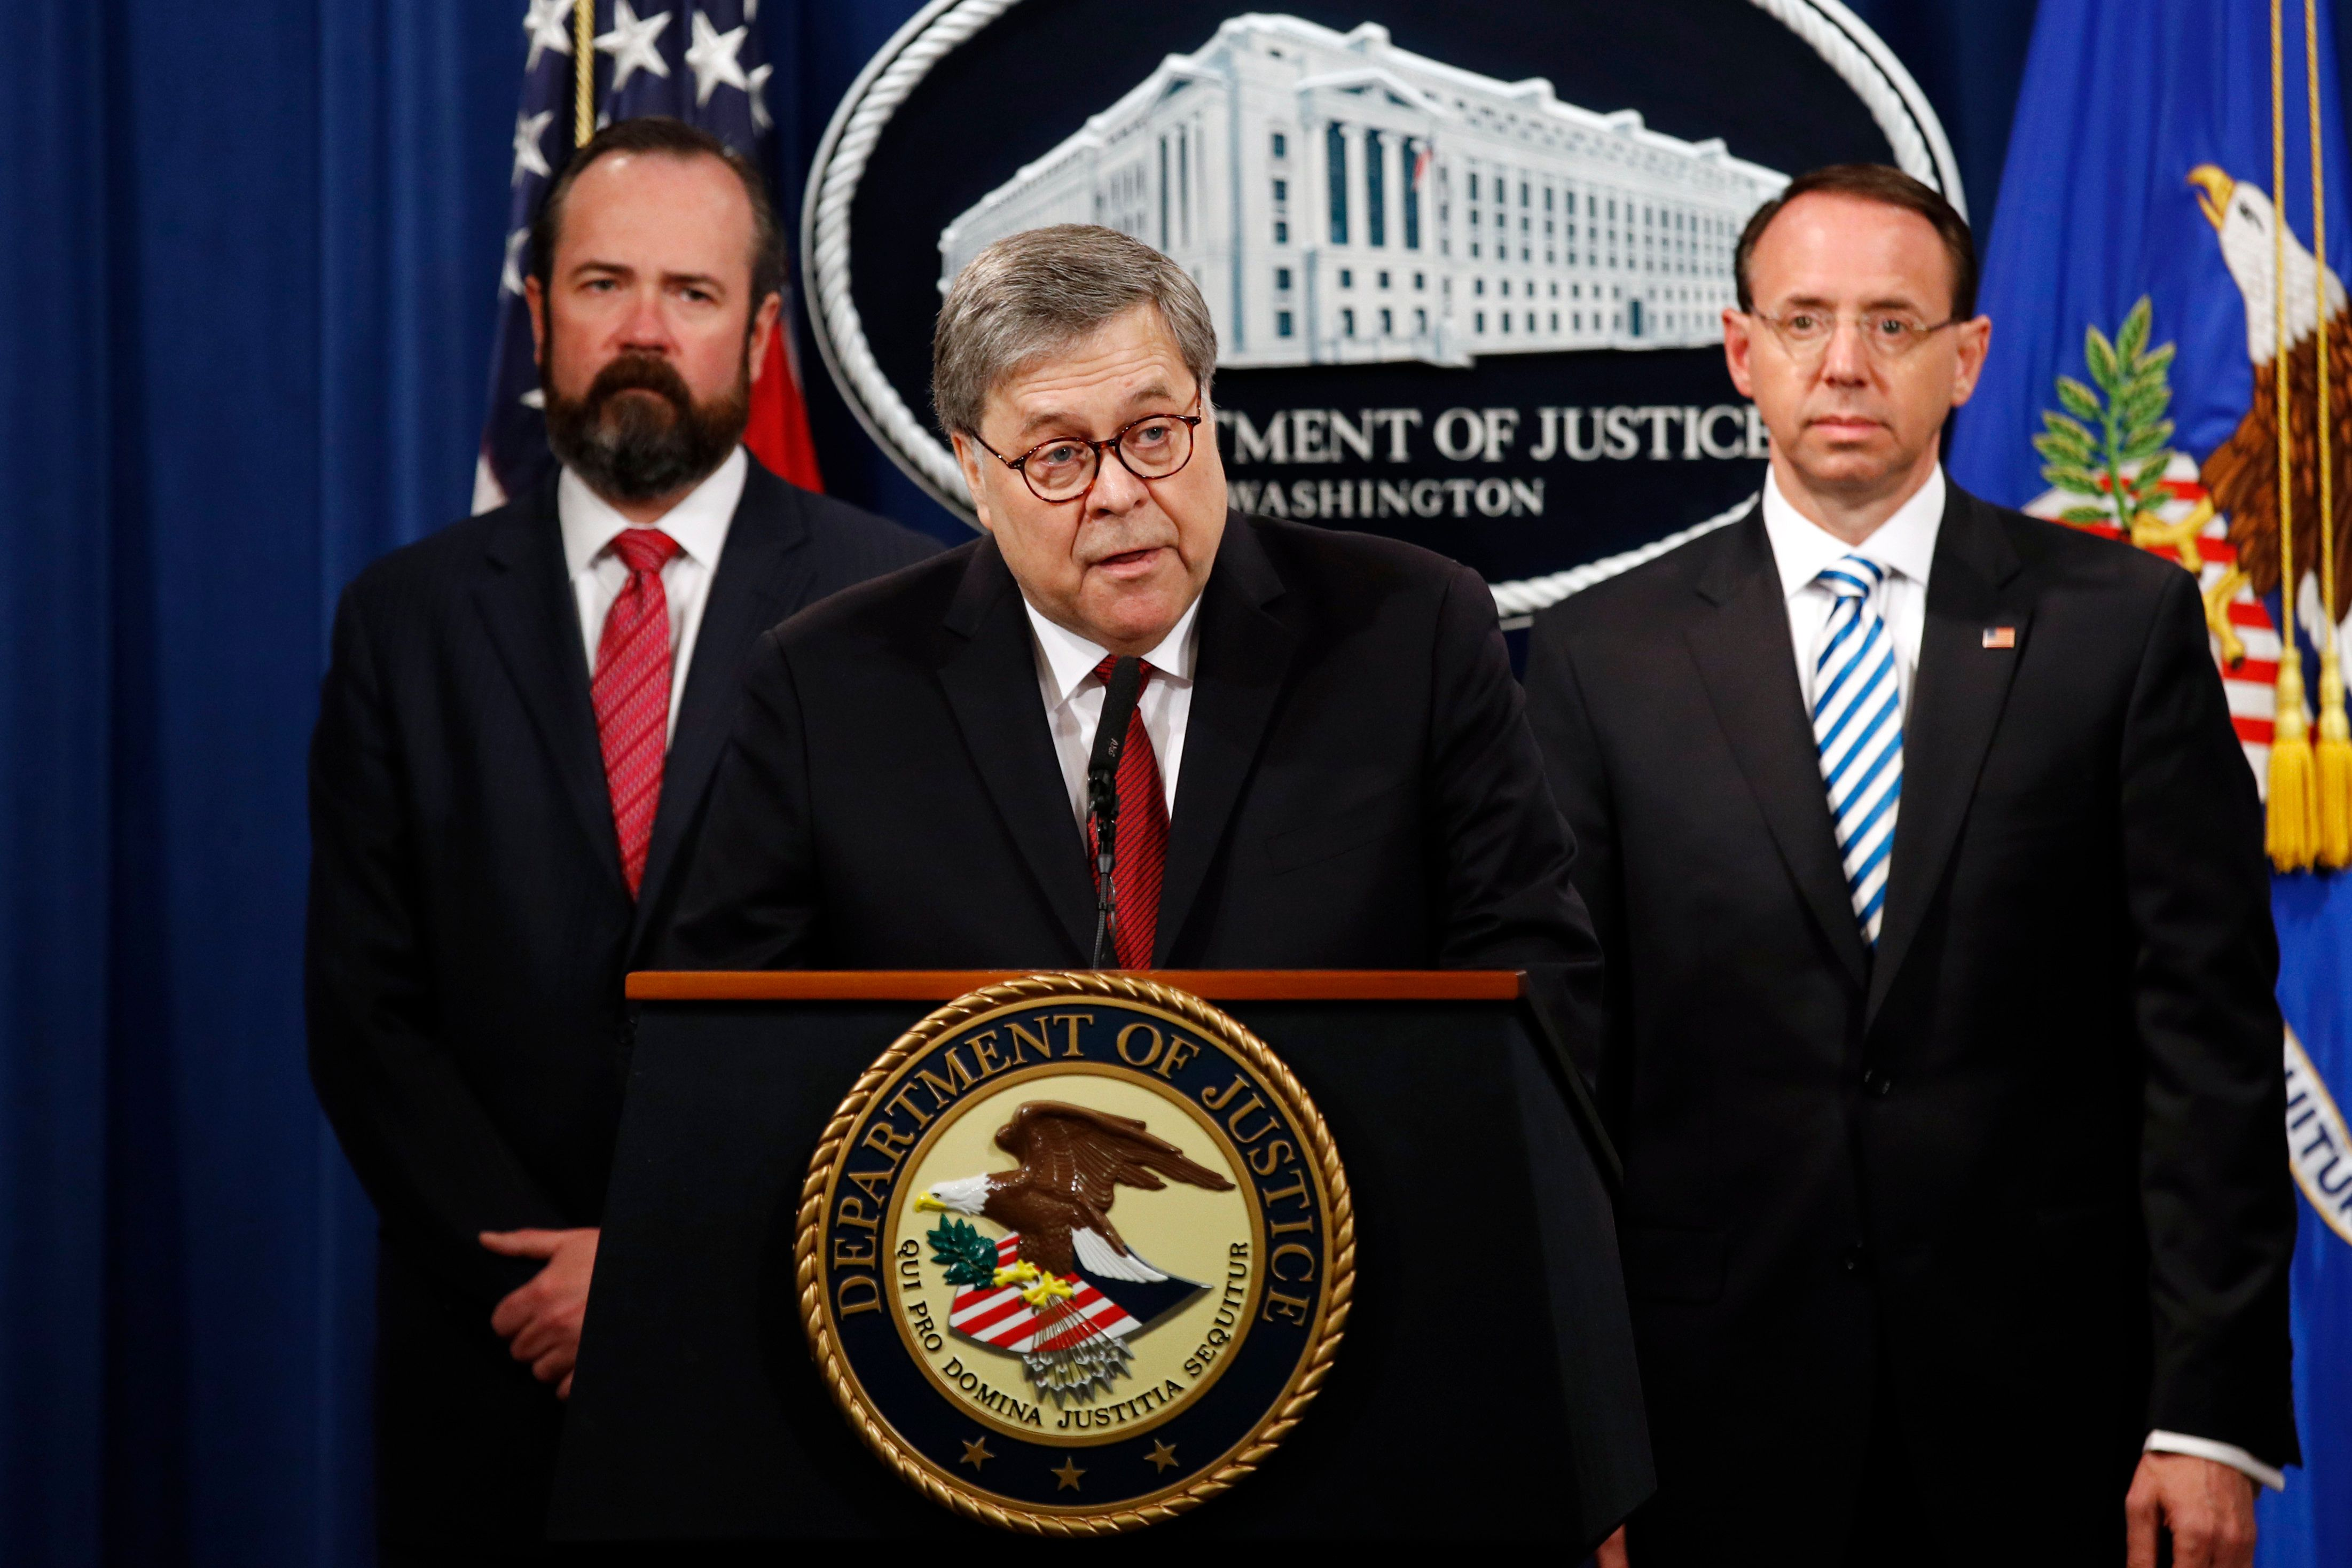 Attorney General William Barr speaks alongside Deputy Attorney General Rod Rosenstein (right) and Deputy Attorney General Ed